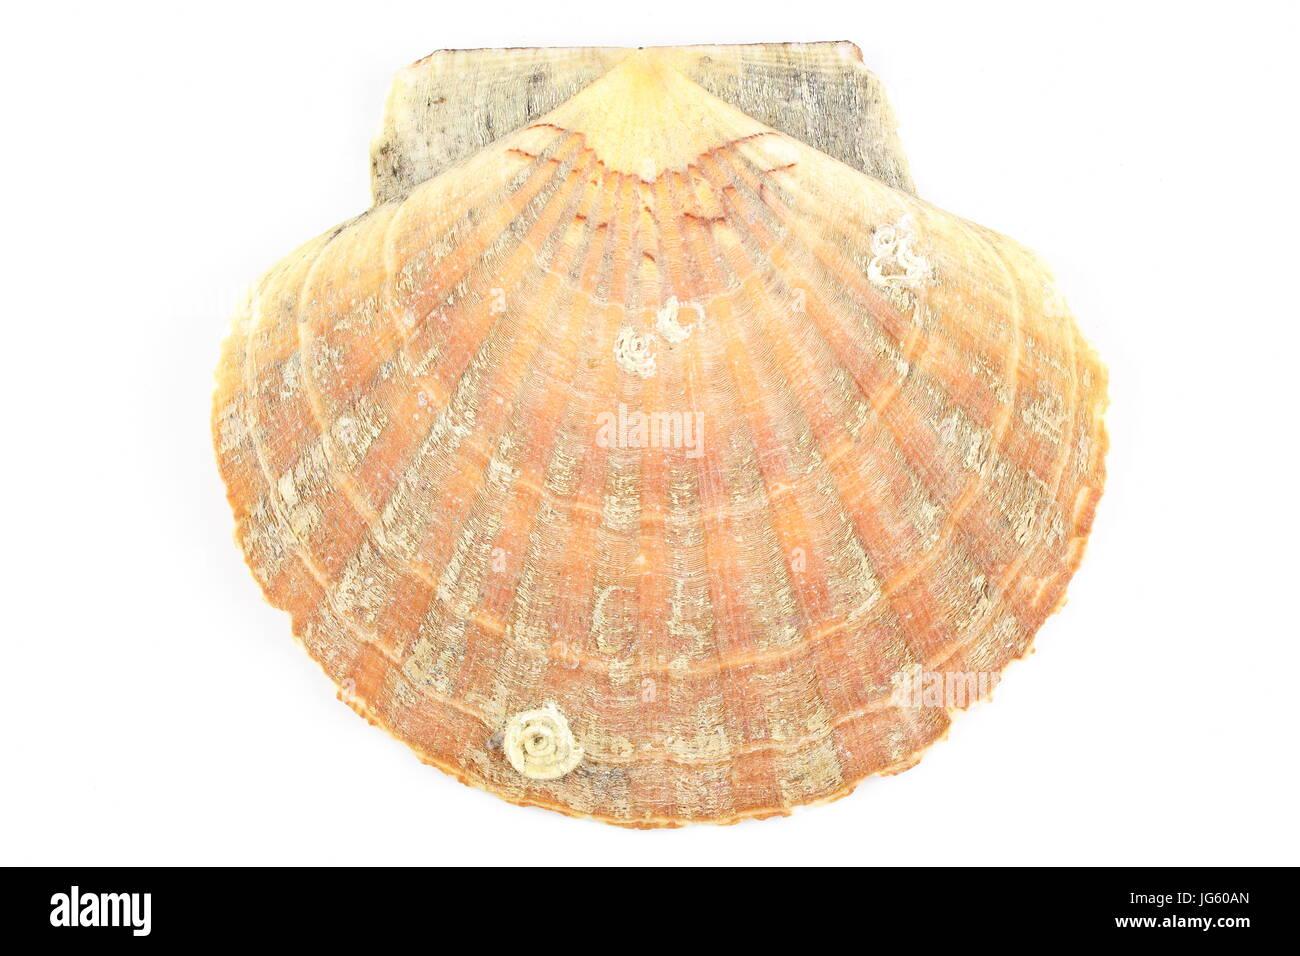 Composición de una concha de vieira aislado sobre un fondo blanco. Imagen De Stock